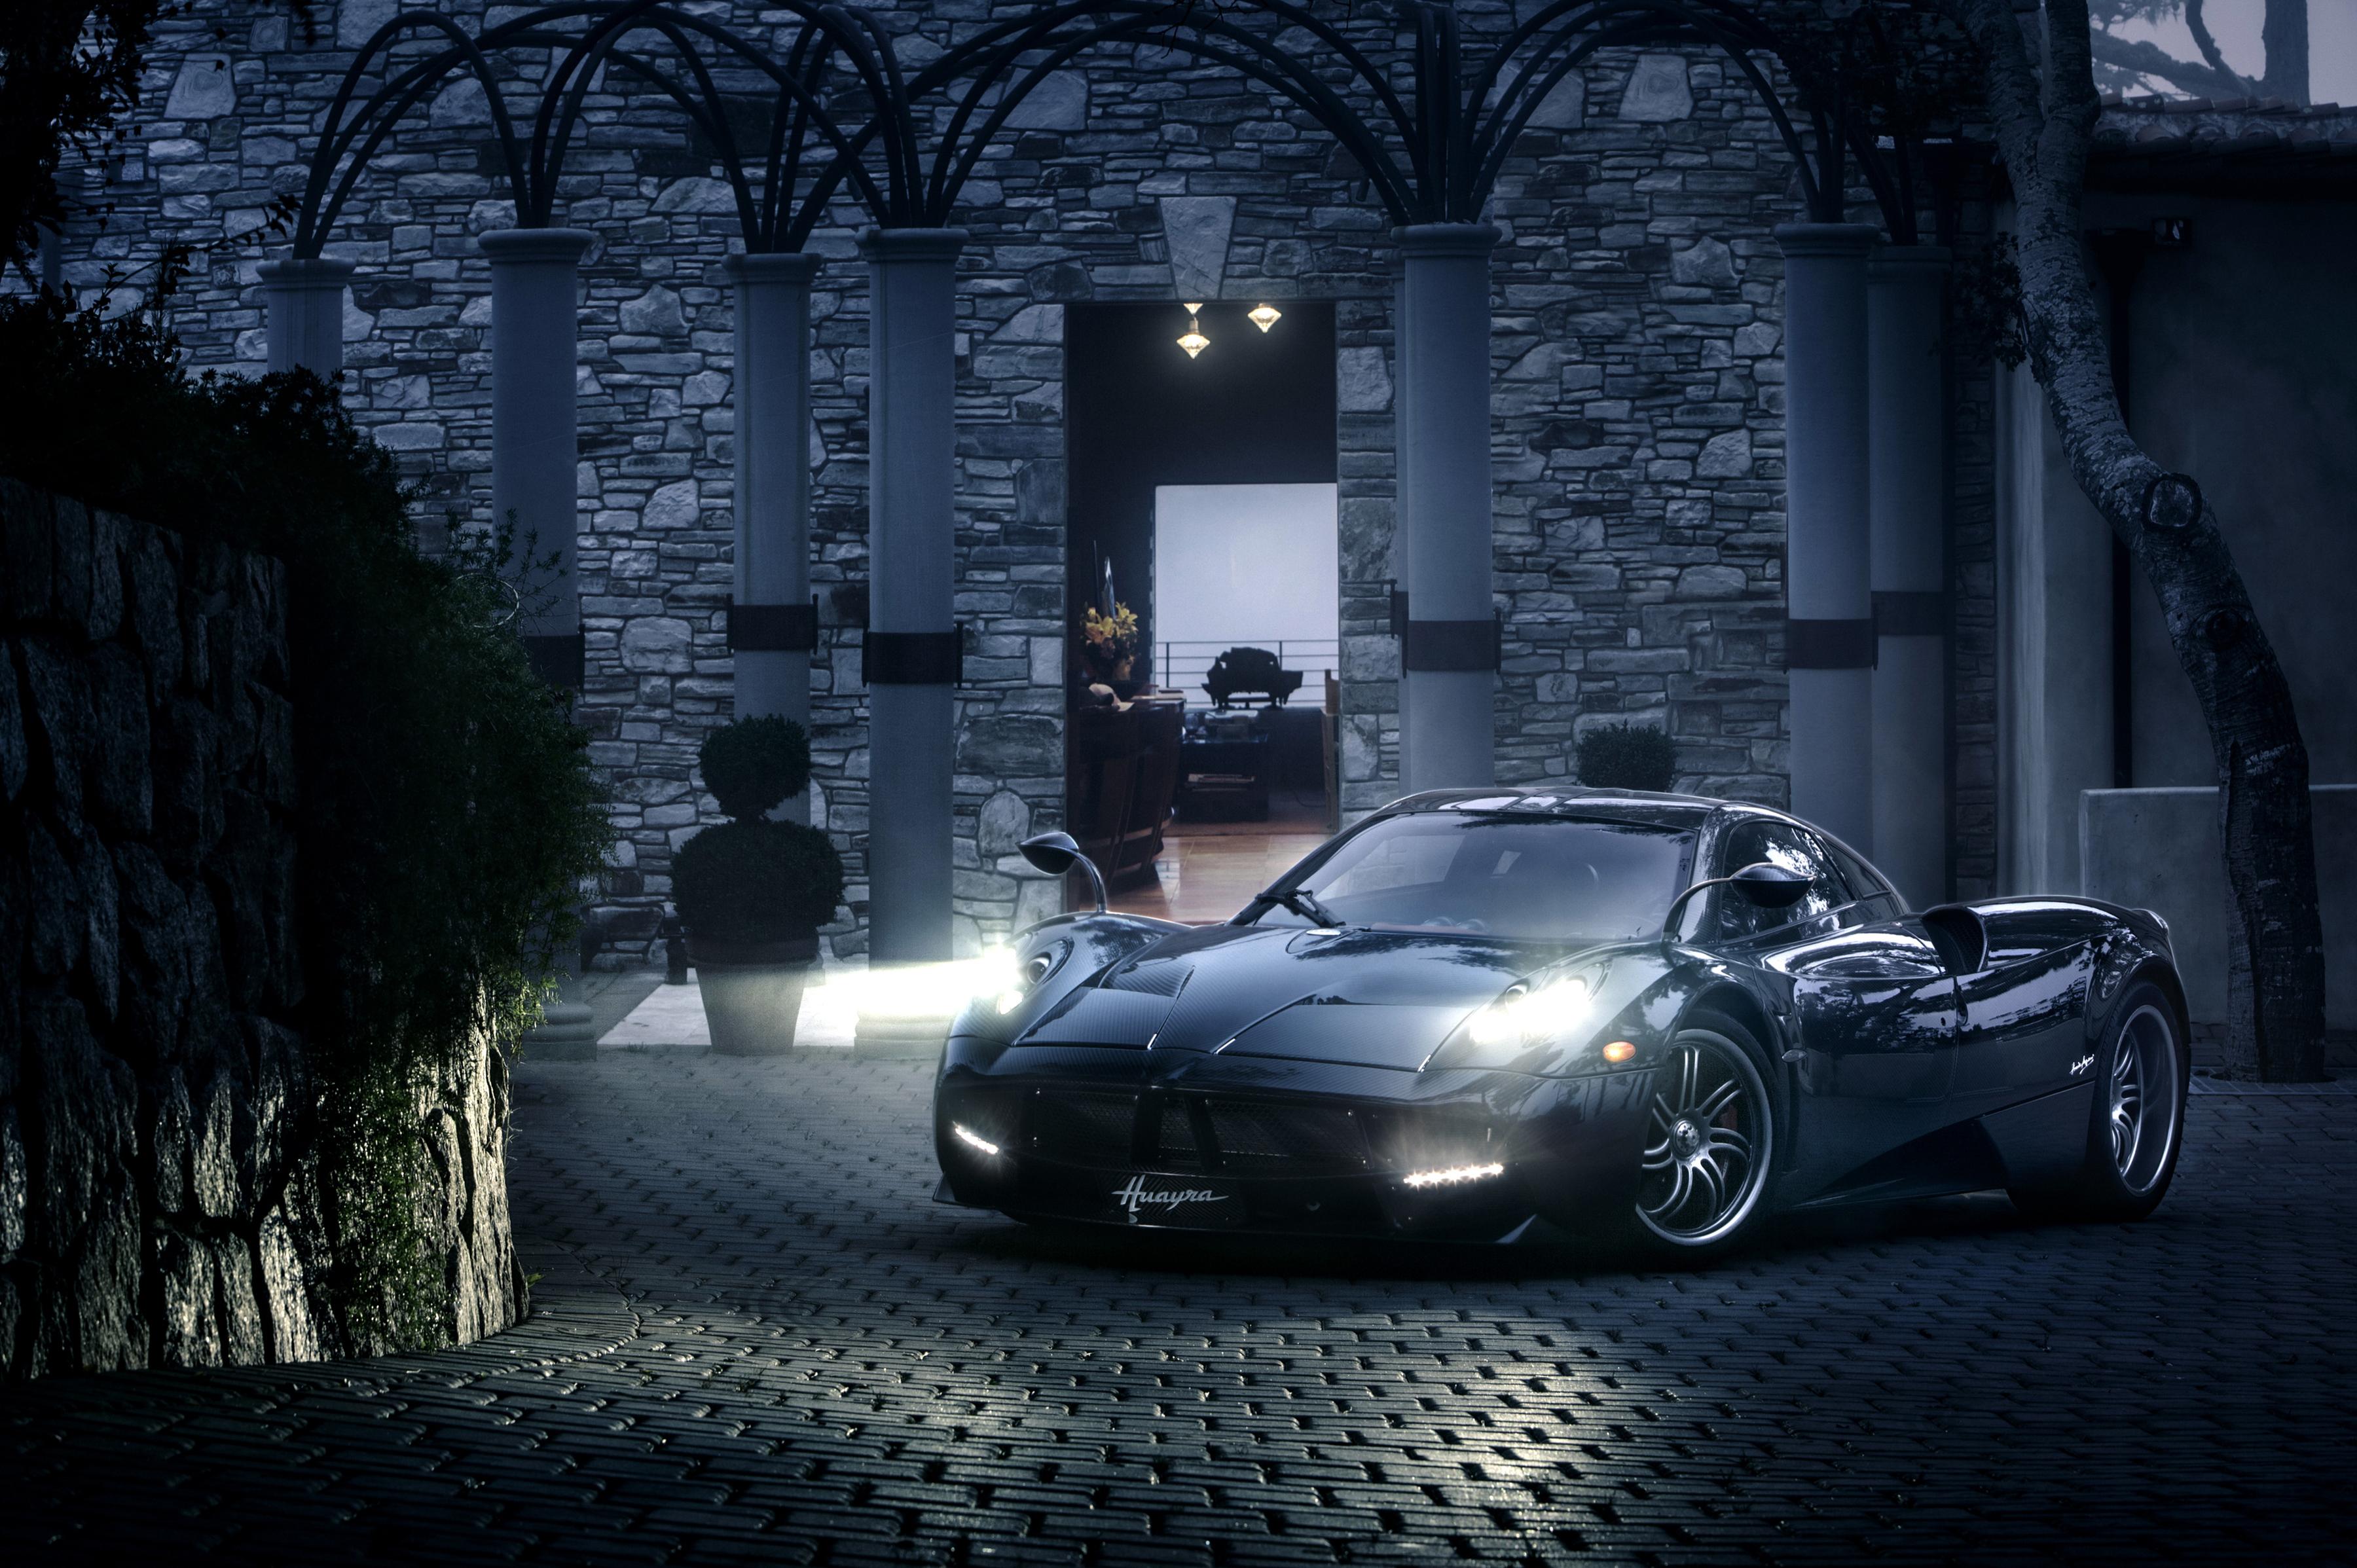 Pagani Car Sport Car Supercar Black Car Night 3600x2395